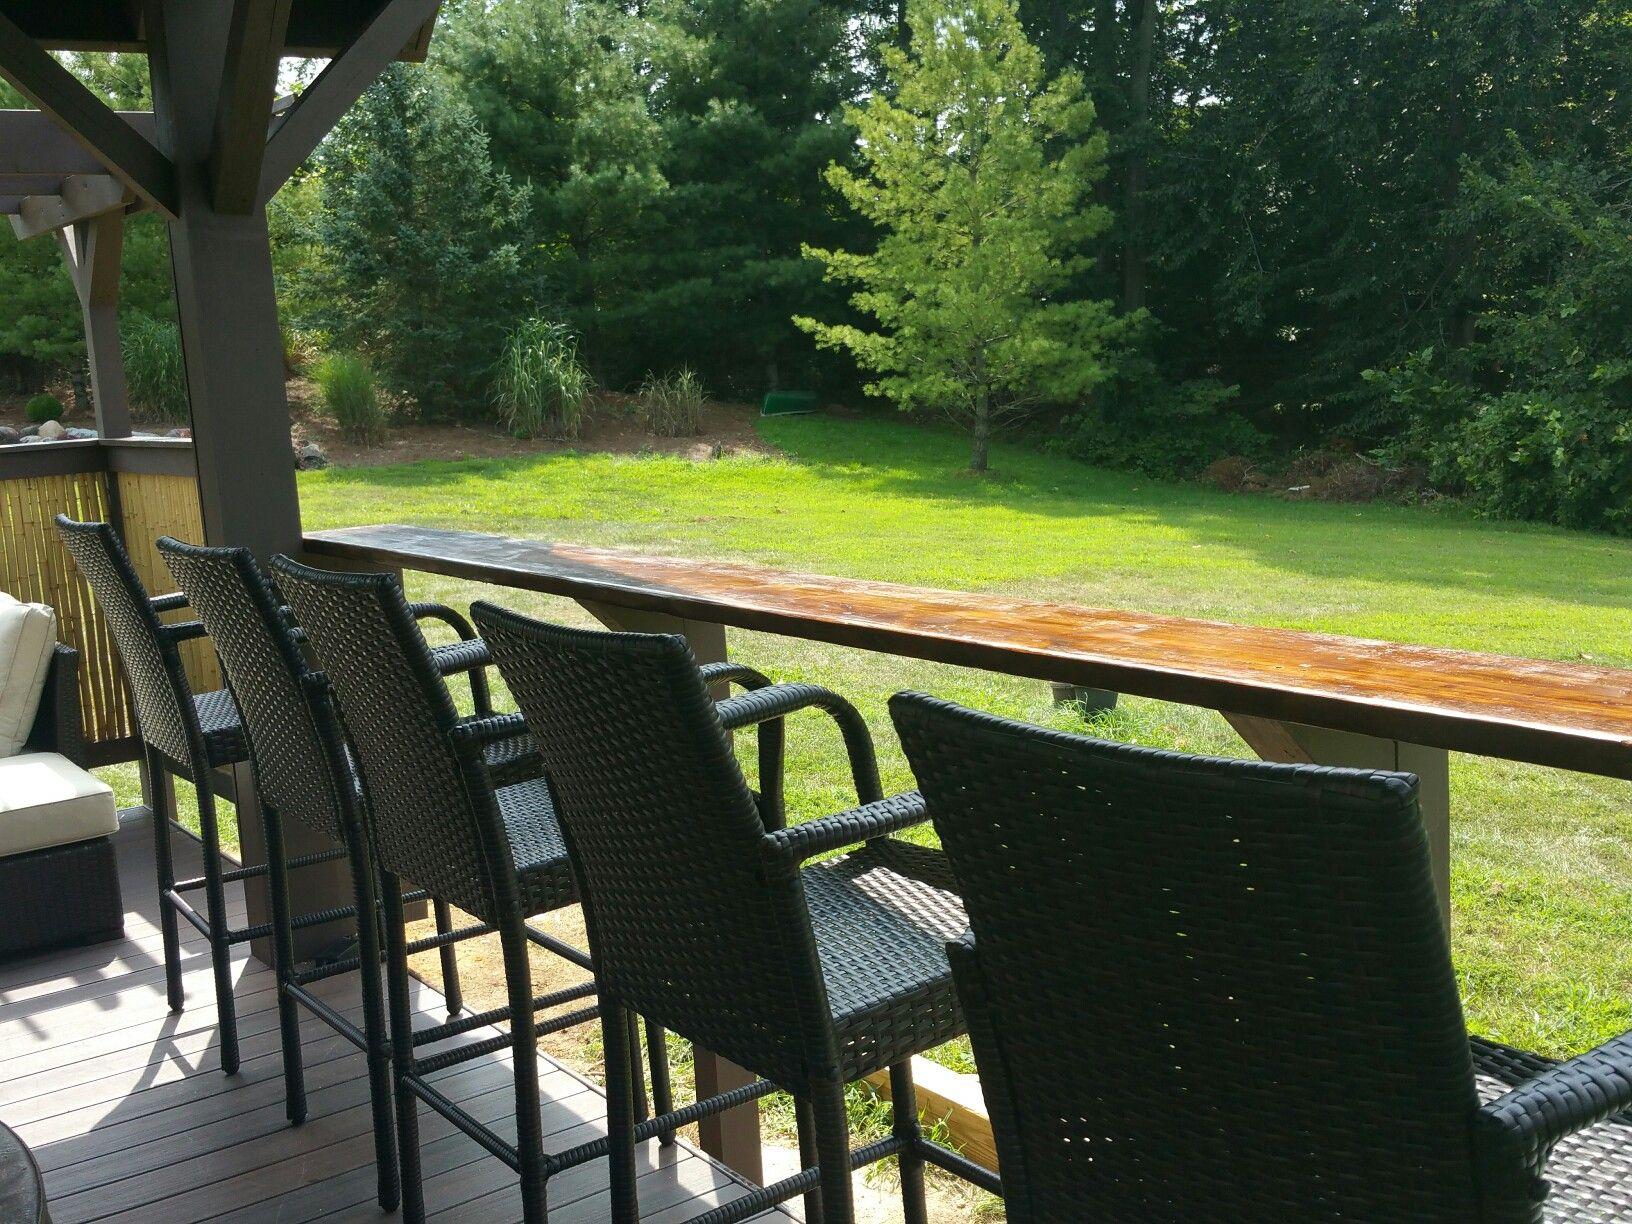 Pin by Rhonda Venuto on Outdoor Pavilion Hot Tub Bar Bamboo Fence